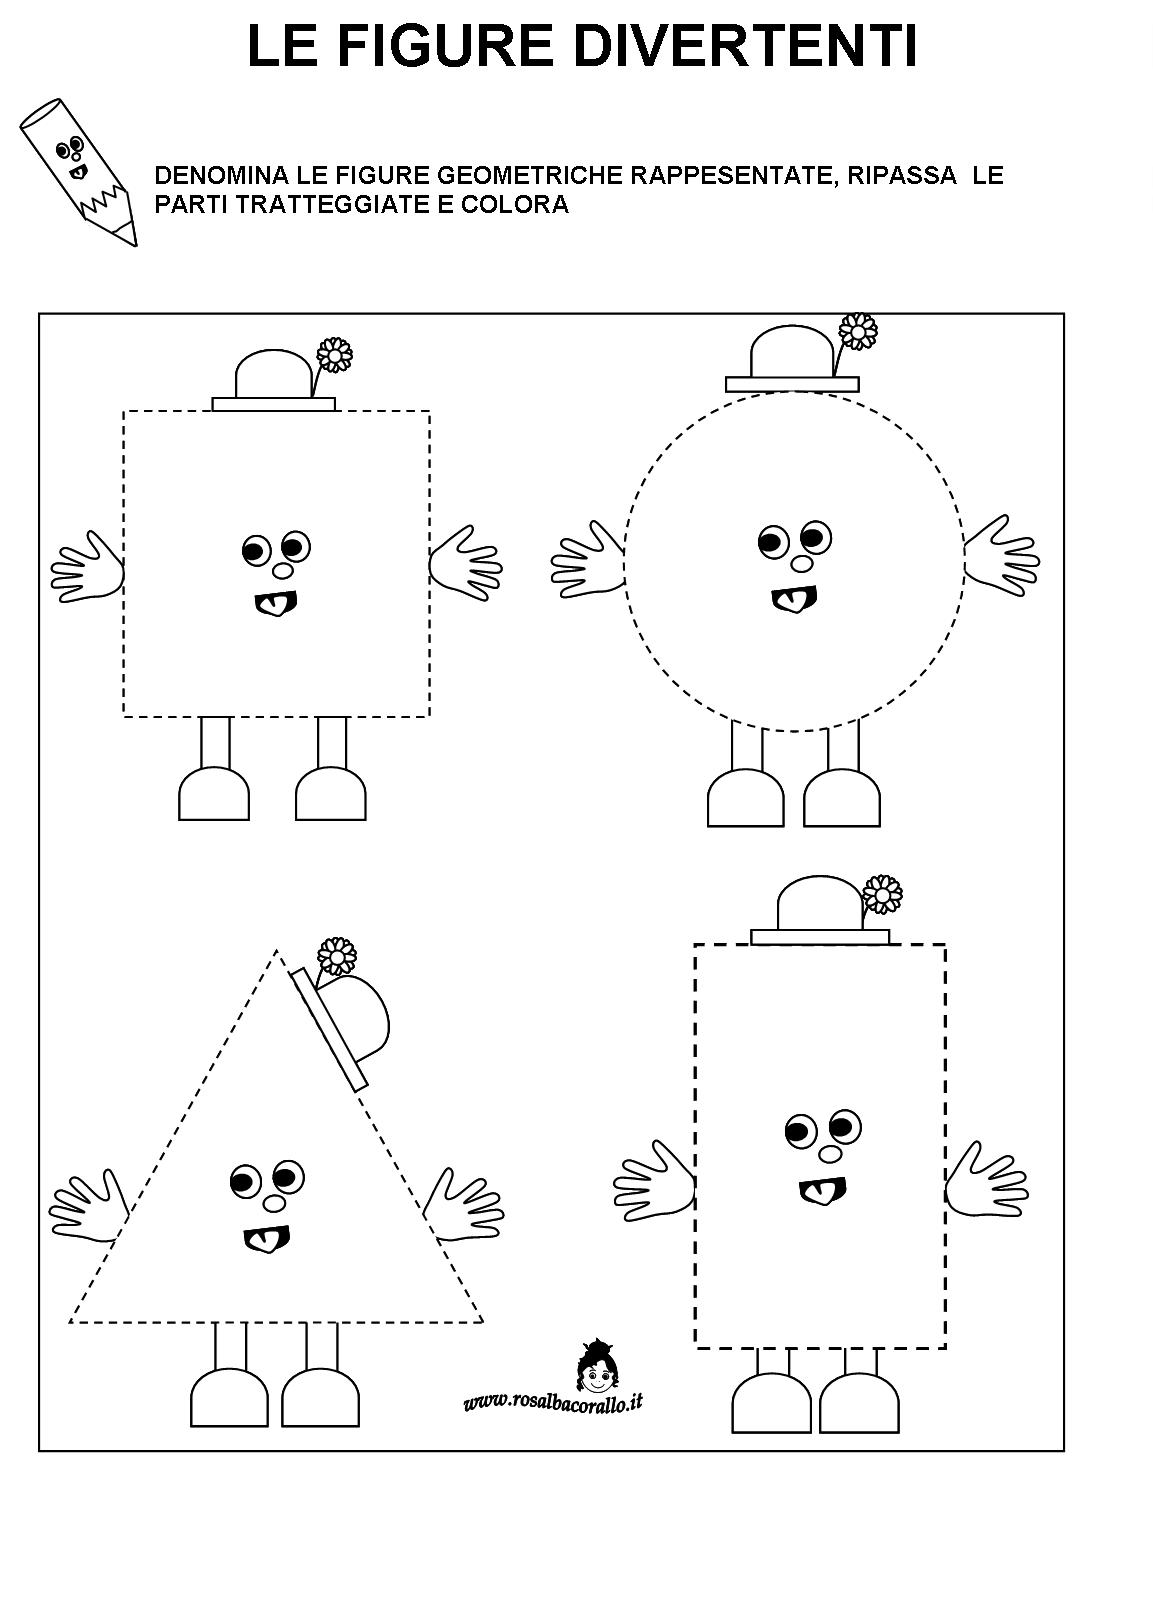 Célèbre Schede didattiche Figure geometriche per bambini di 4/5 anni  NG21